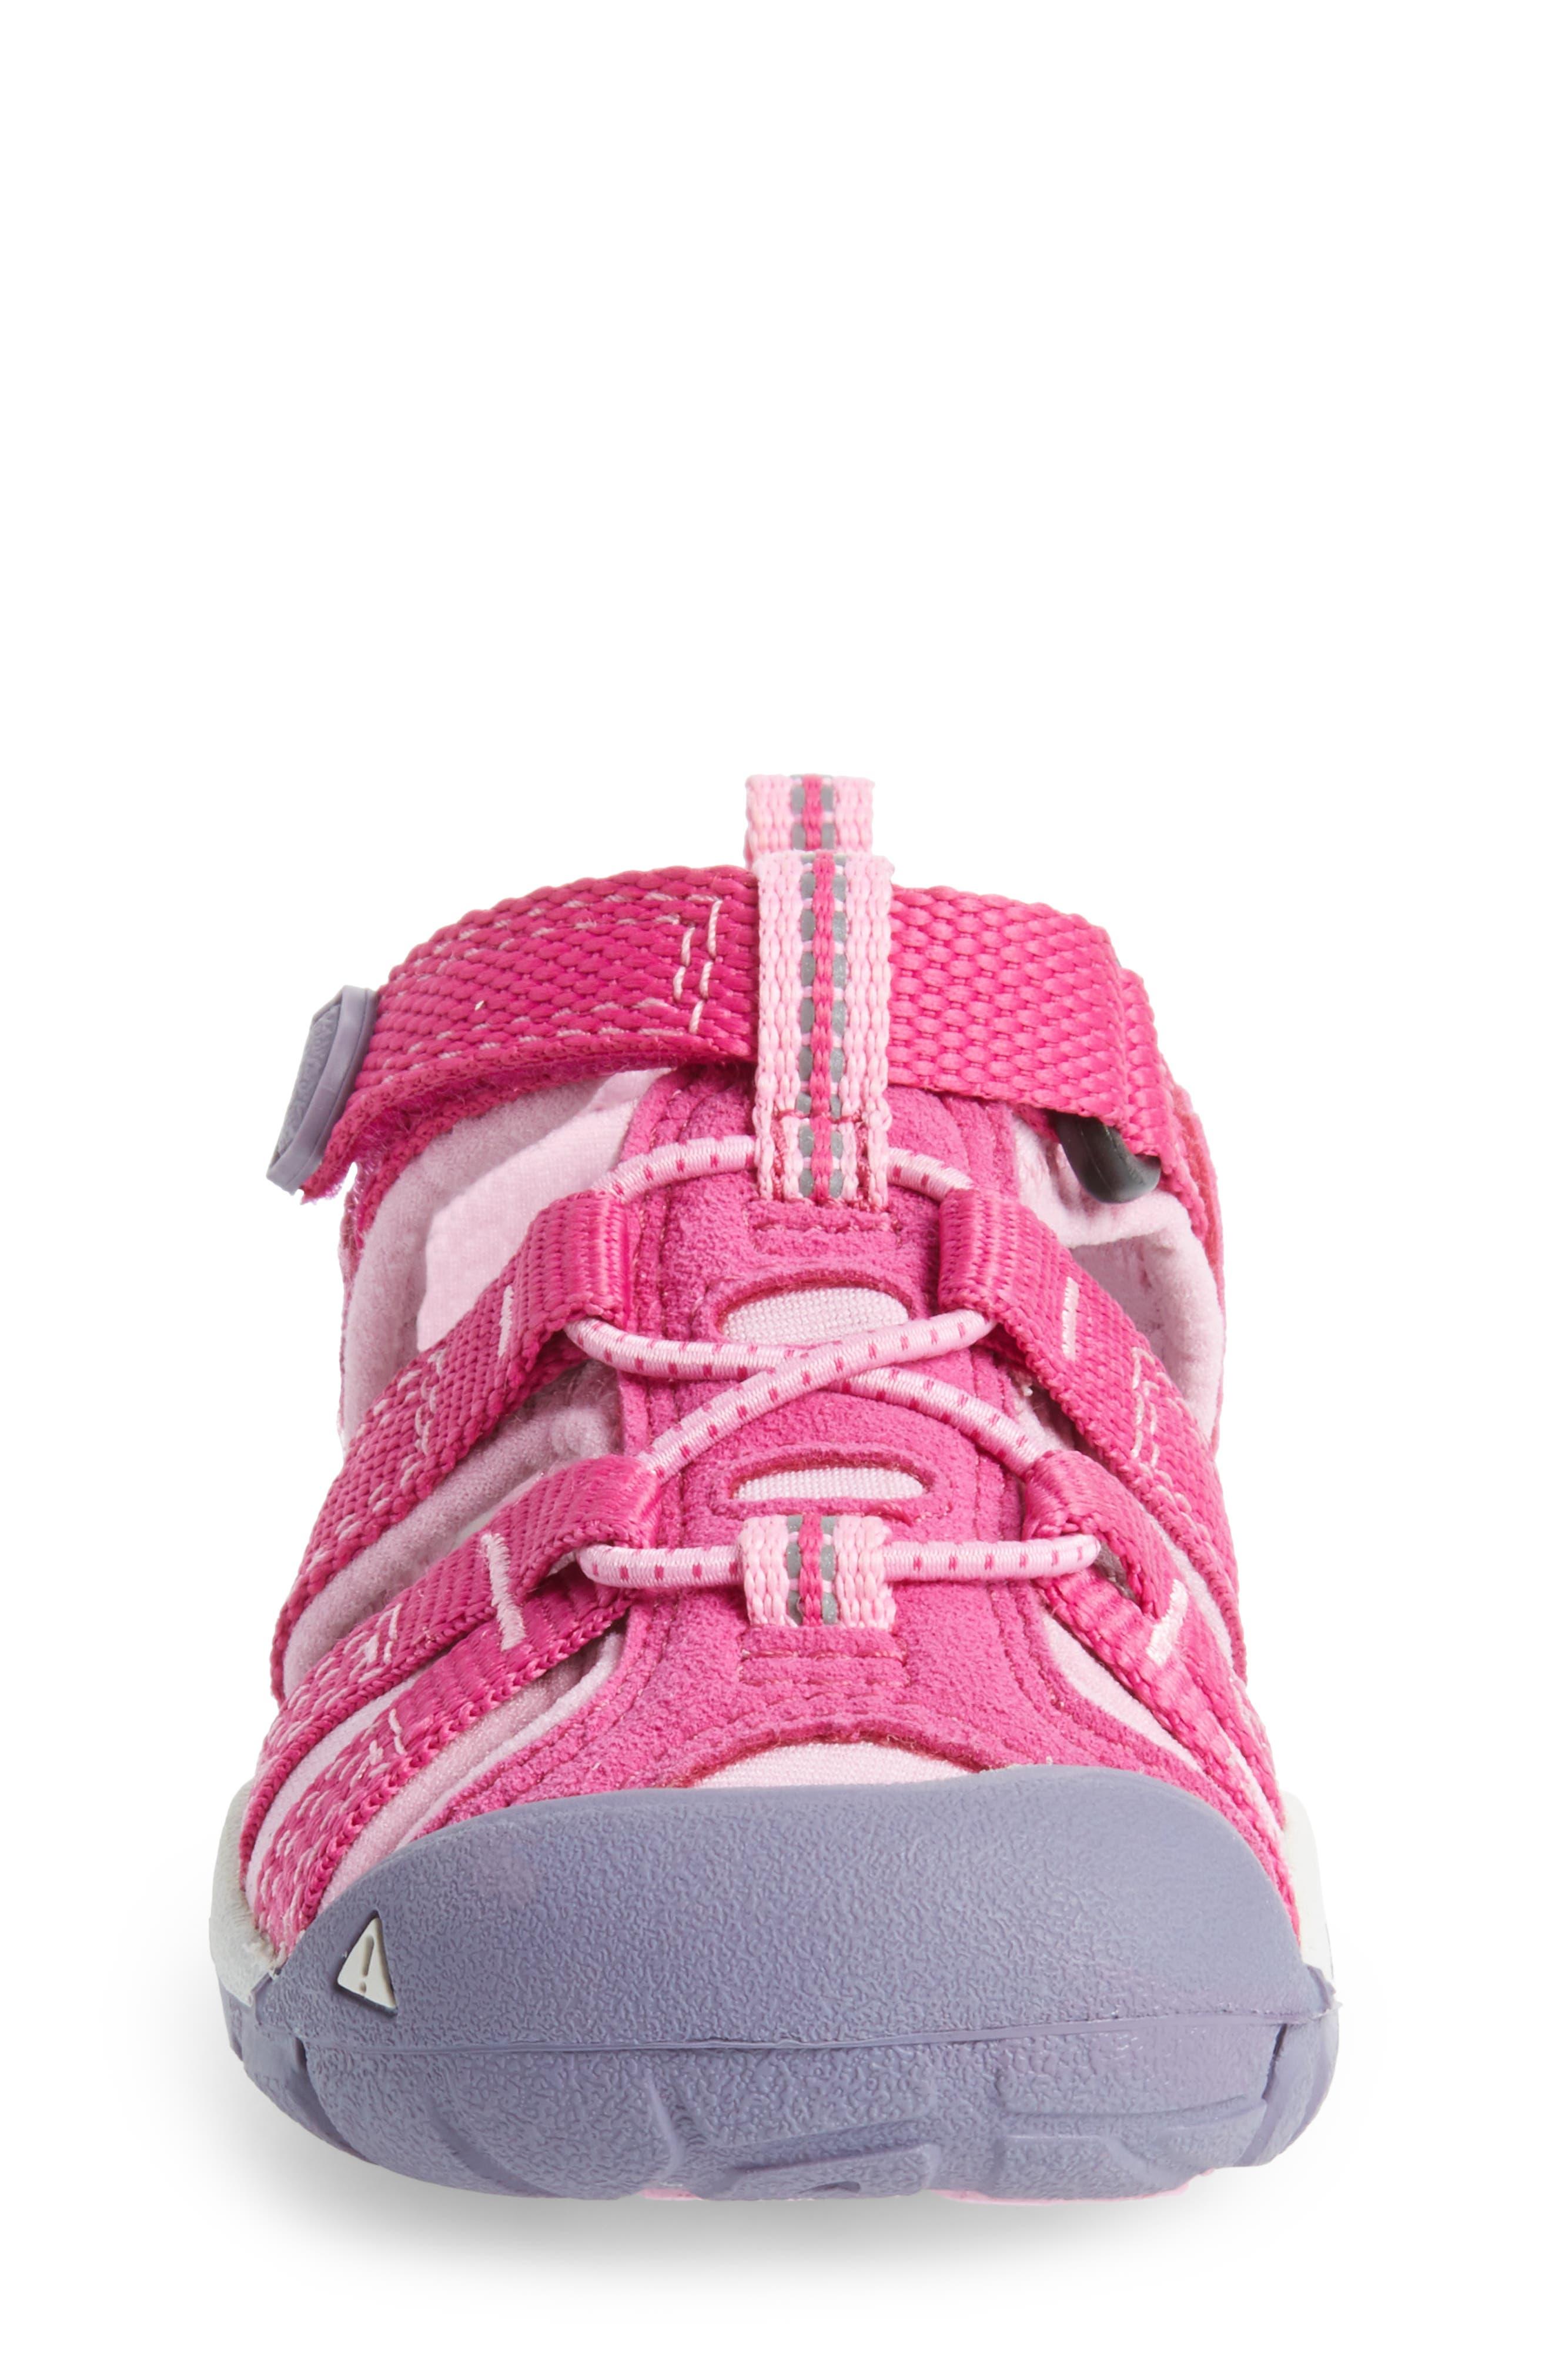 'Seacamp II' Water Friendly Sandal,                             Alternate thumbnail 4, color,                             Very Berry/ Lilac Chiffon